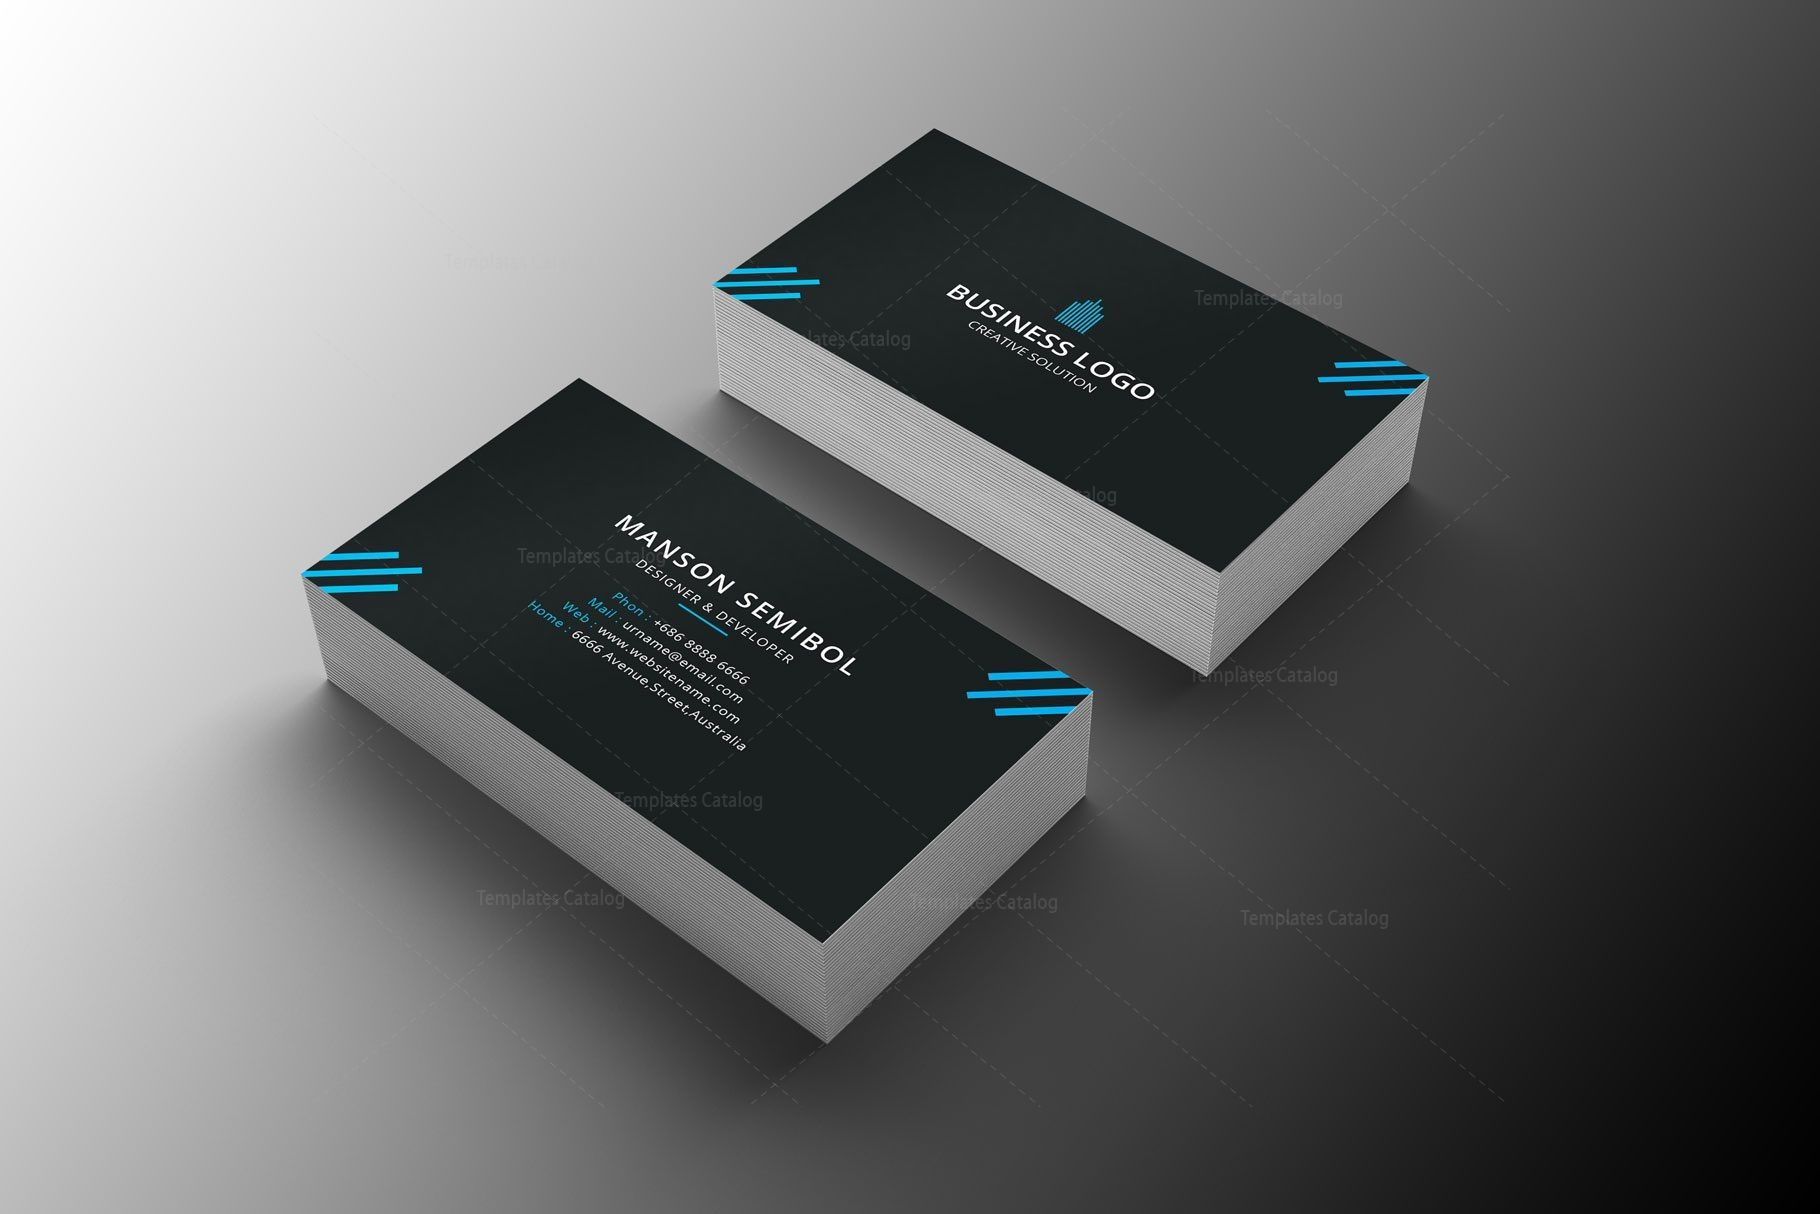 Minimal Mechanic Business Card Design Graphic Templates Business Card Template Design Business Card Design Graphic Design Business Card